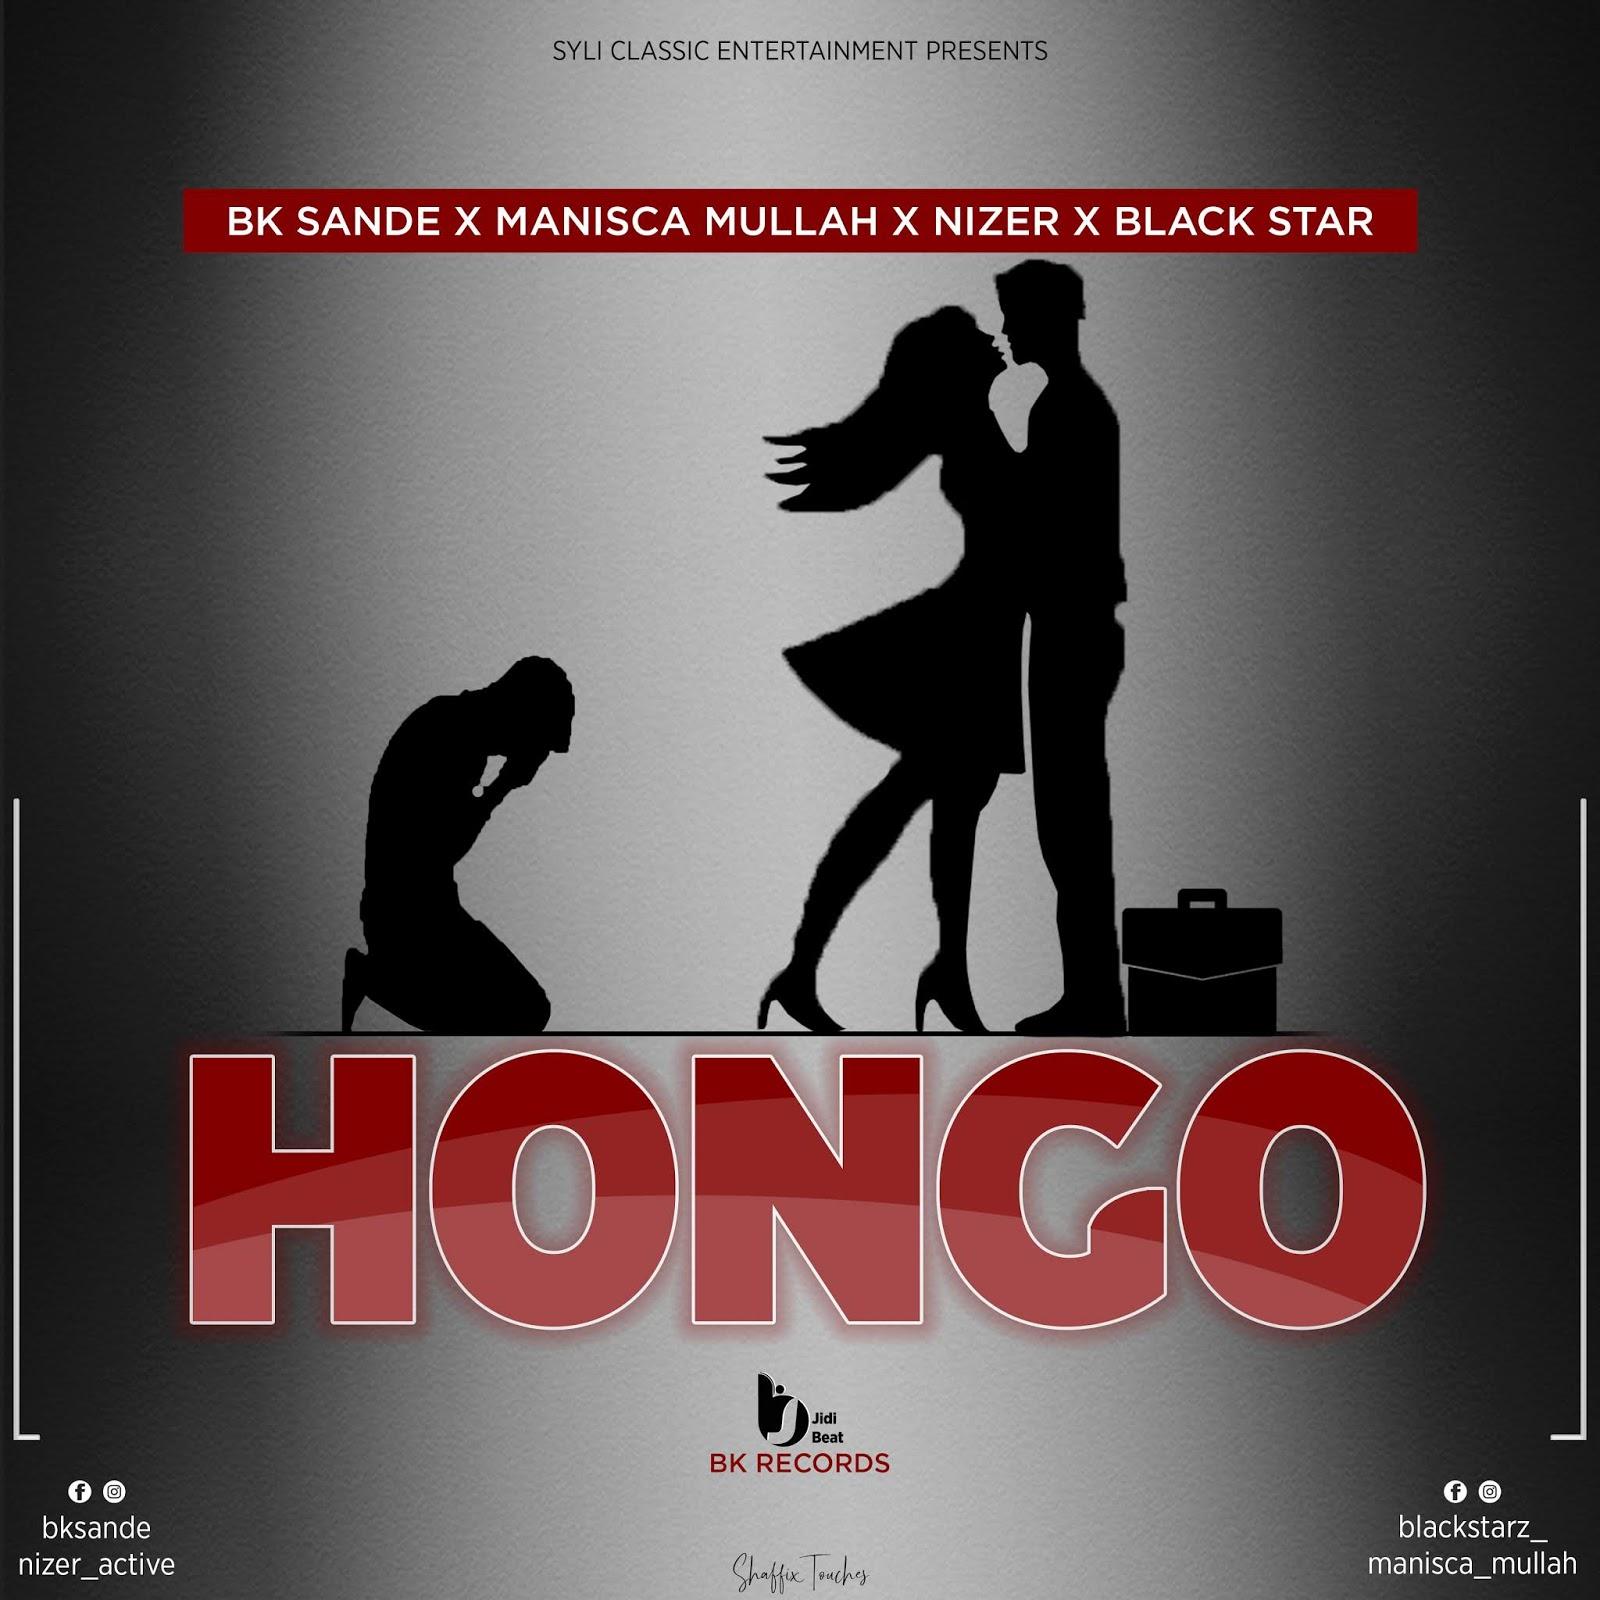 Bk Sande x Nizer x Black Star x Manisca - HONGO